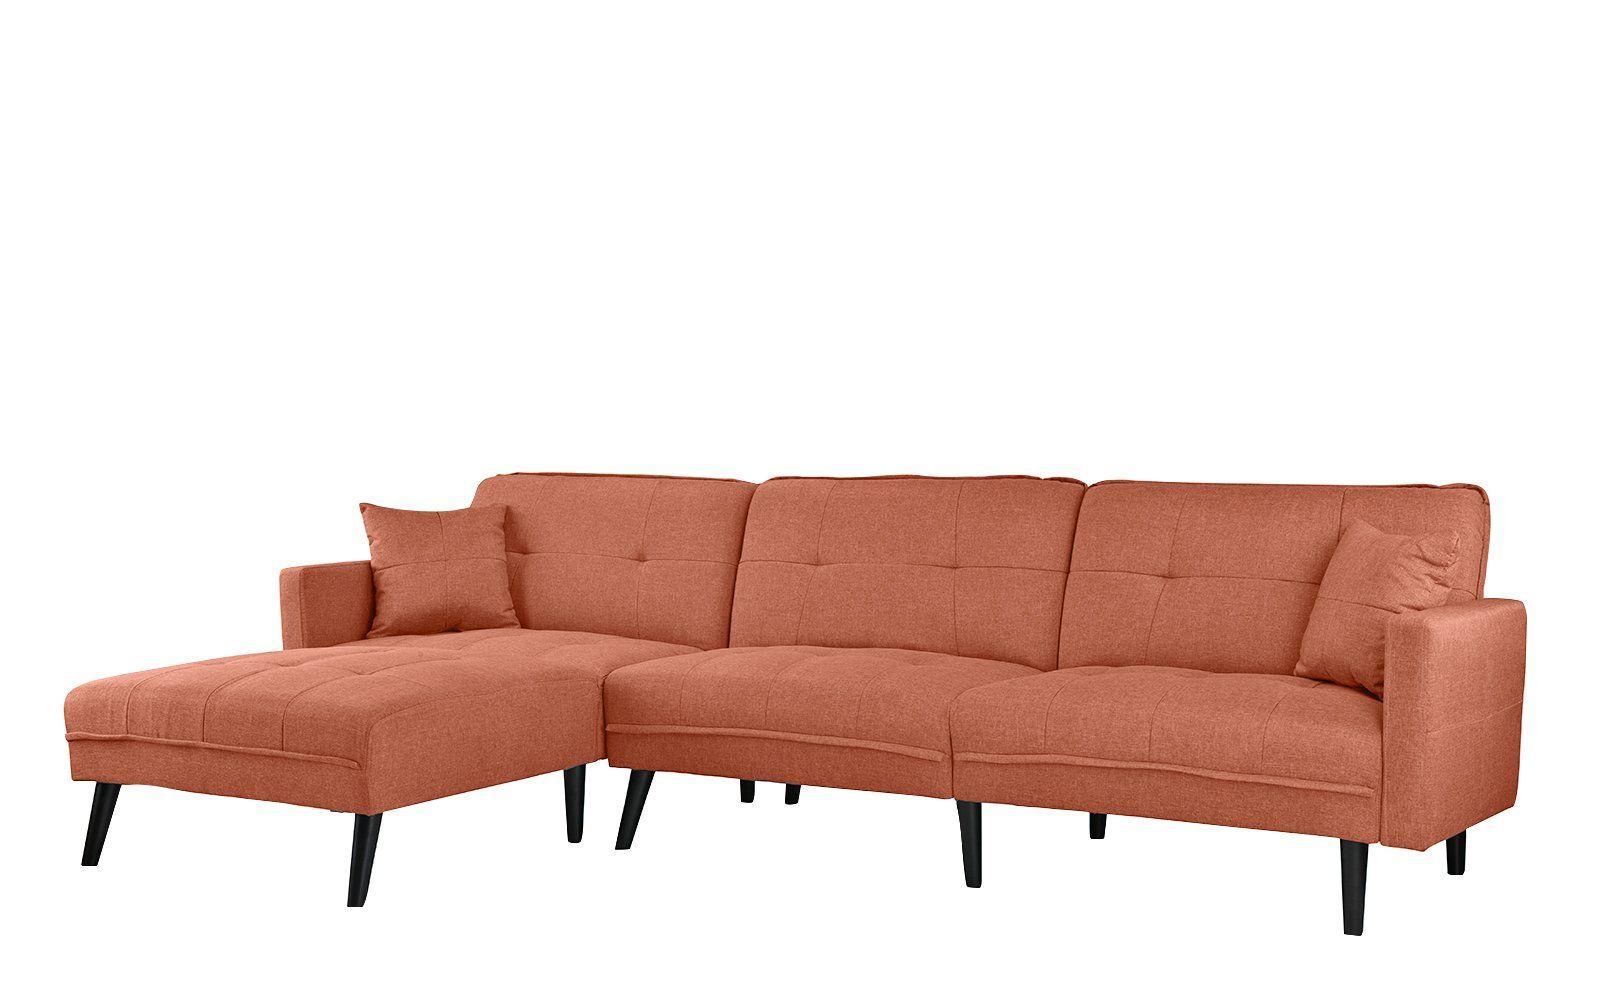 Fine Romulo Mid Century Modern Linen Sleeper Sectional Living Forskolin Free Trial Chair Design Images Forskolin Free Trialorg